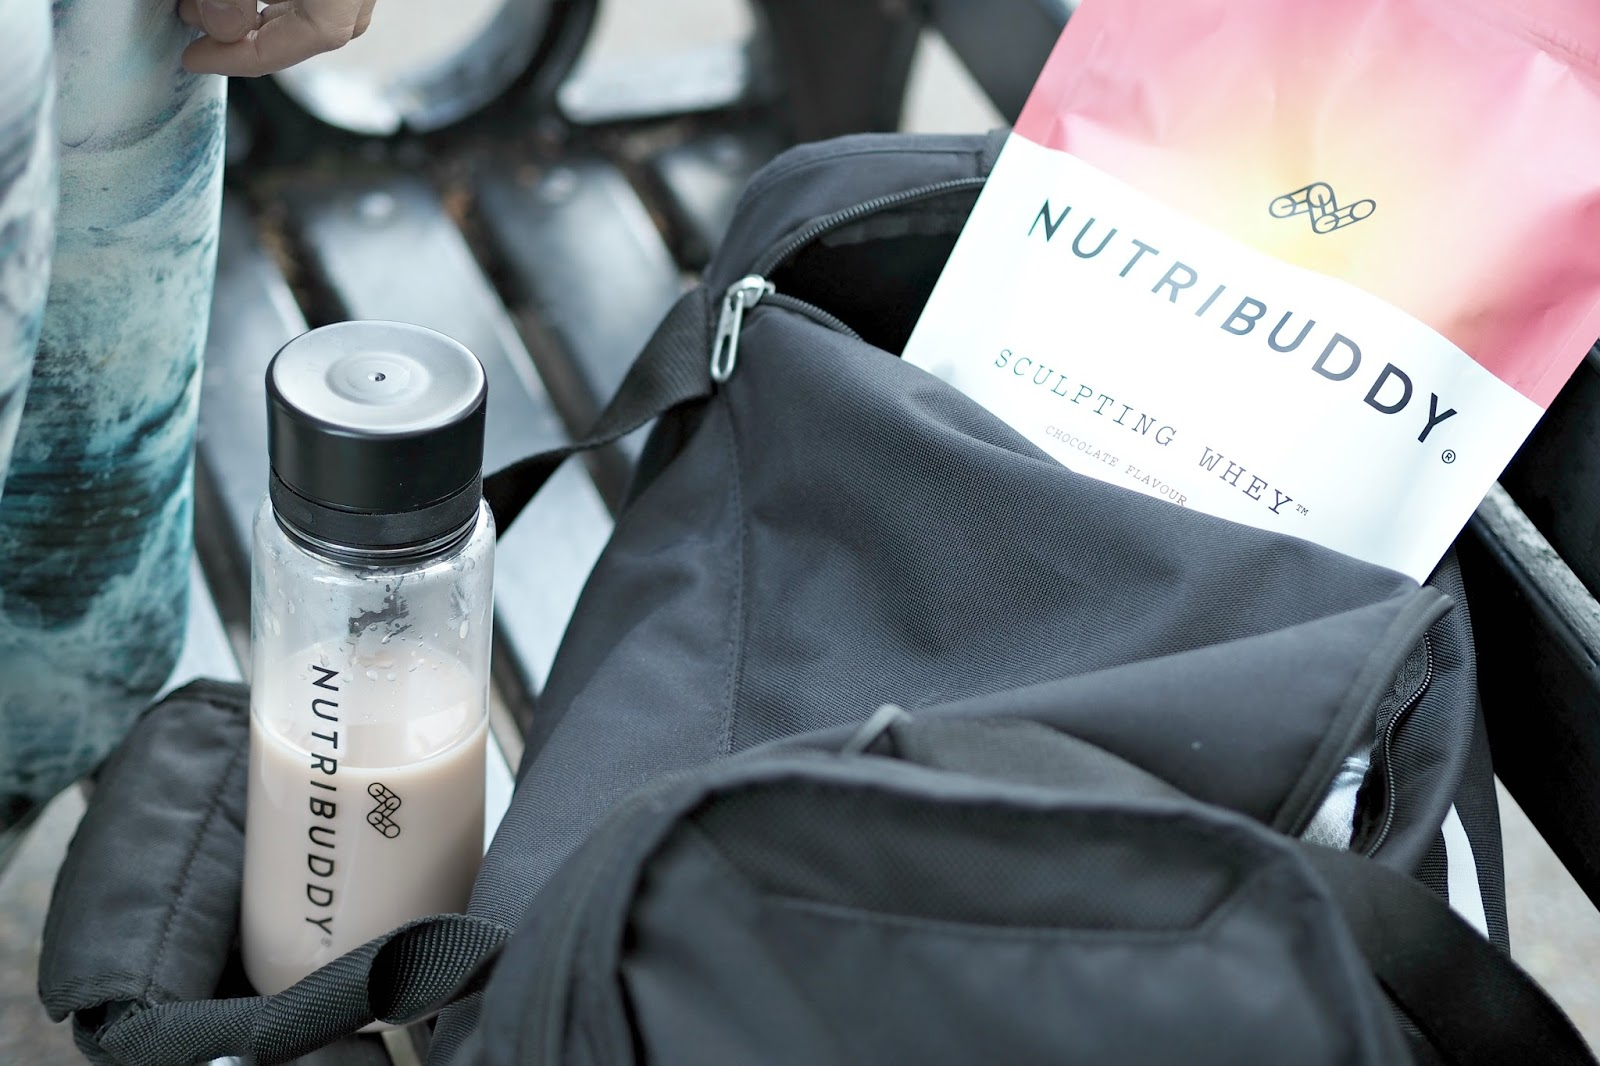 inside a fitness bloggers gym bag, copper garden, nutri buddy,